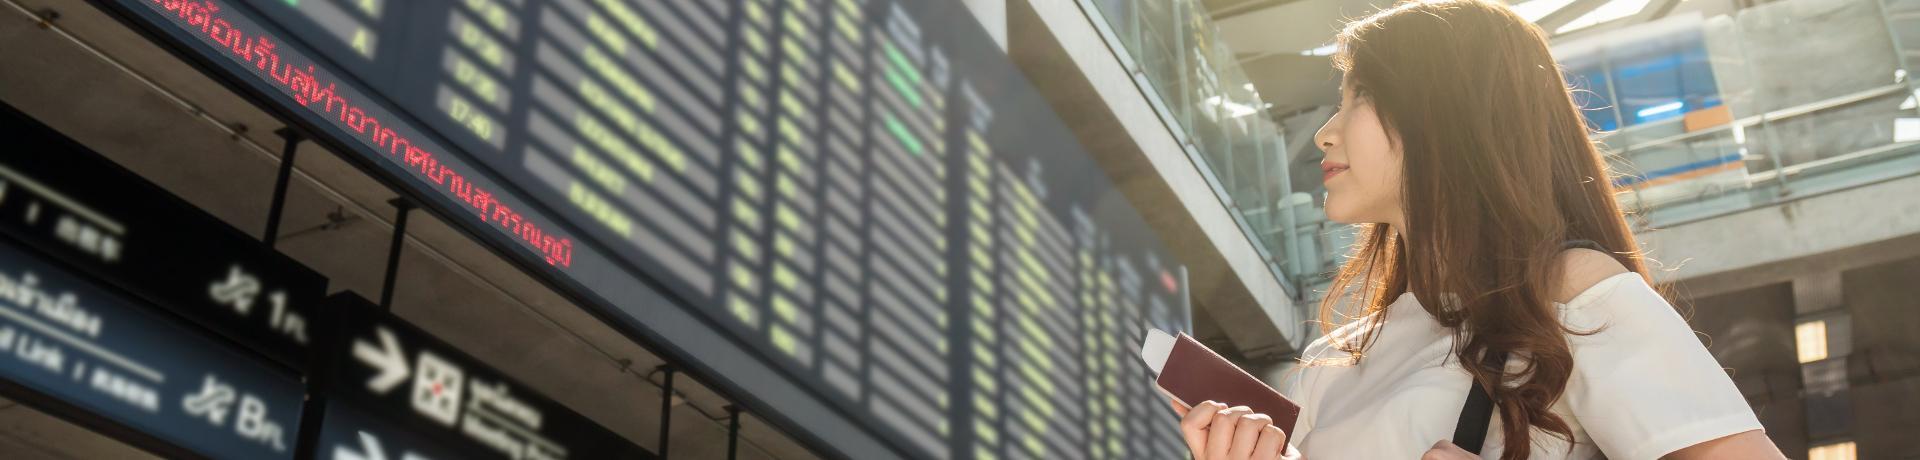 Emotion: Flughafen - Frau- Reisepass - Anzeigetafel